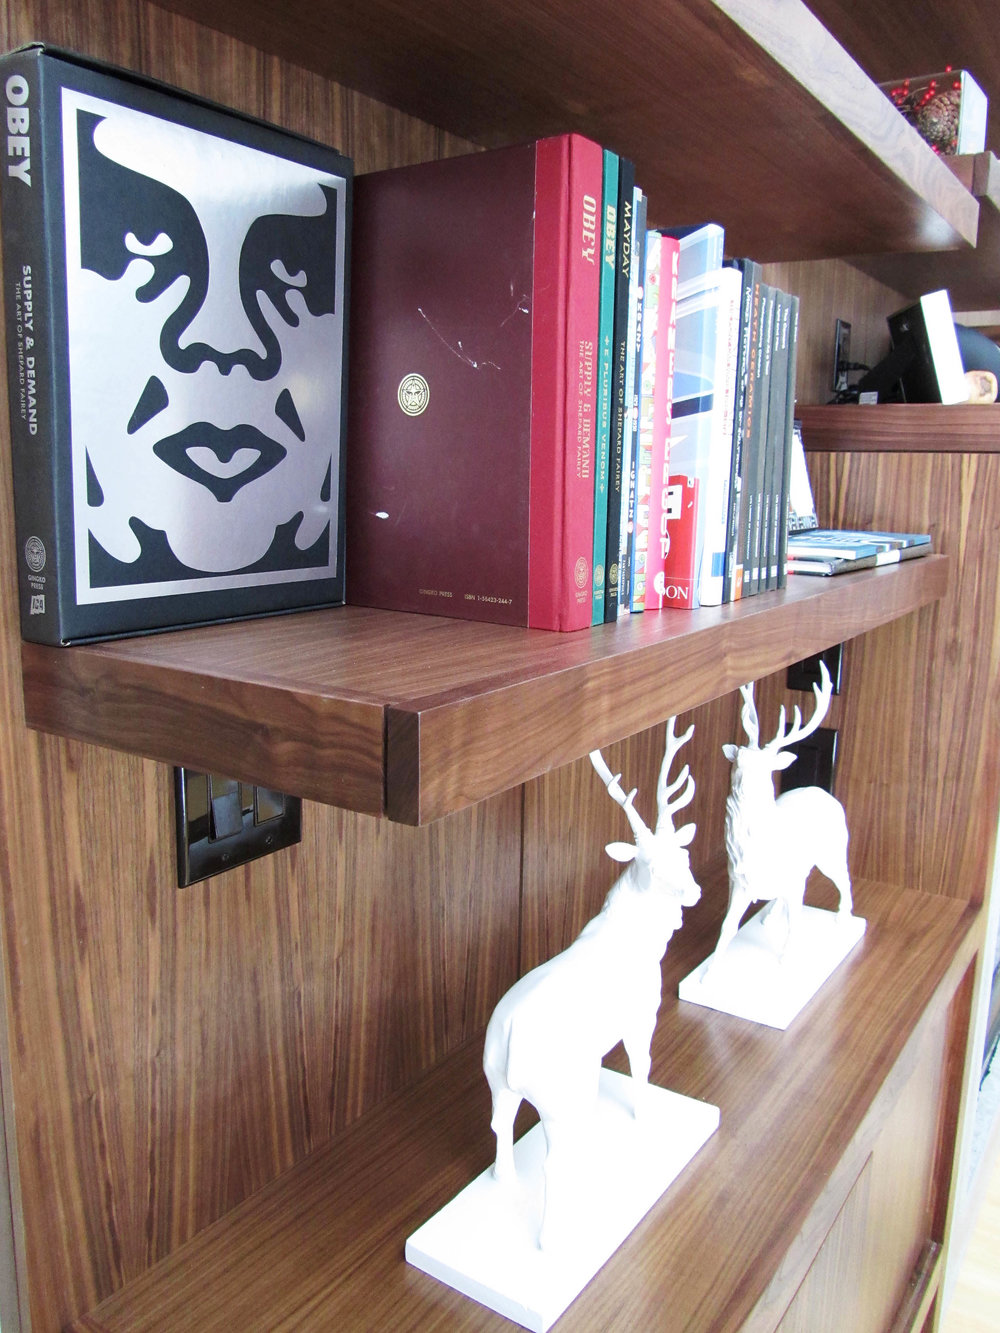 Honore-Cabinetry-custom-modern-walnut-wall-unit-shelves-cabinets-detail2.jpg